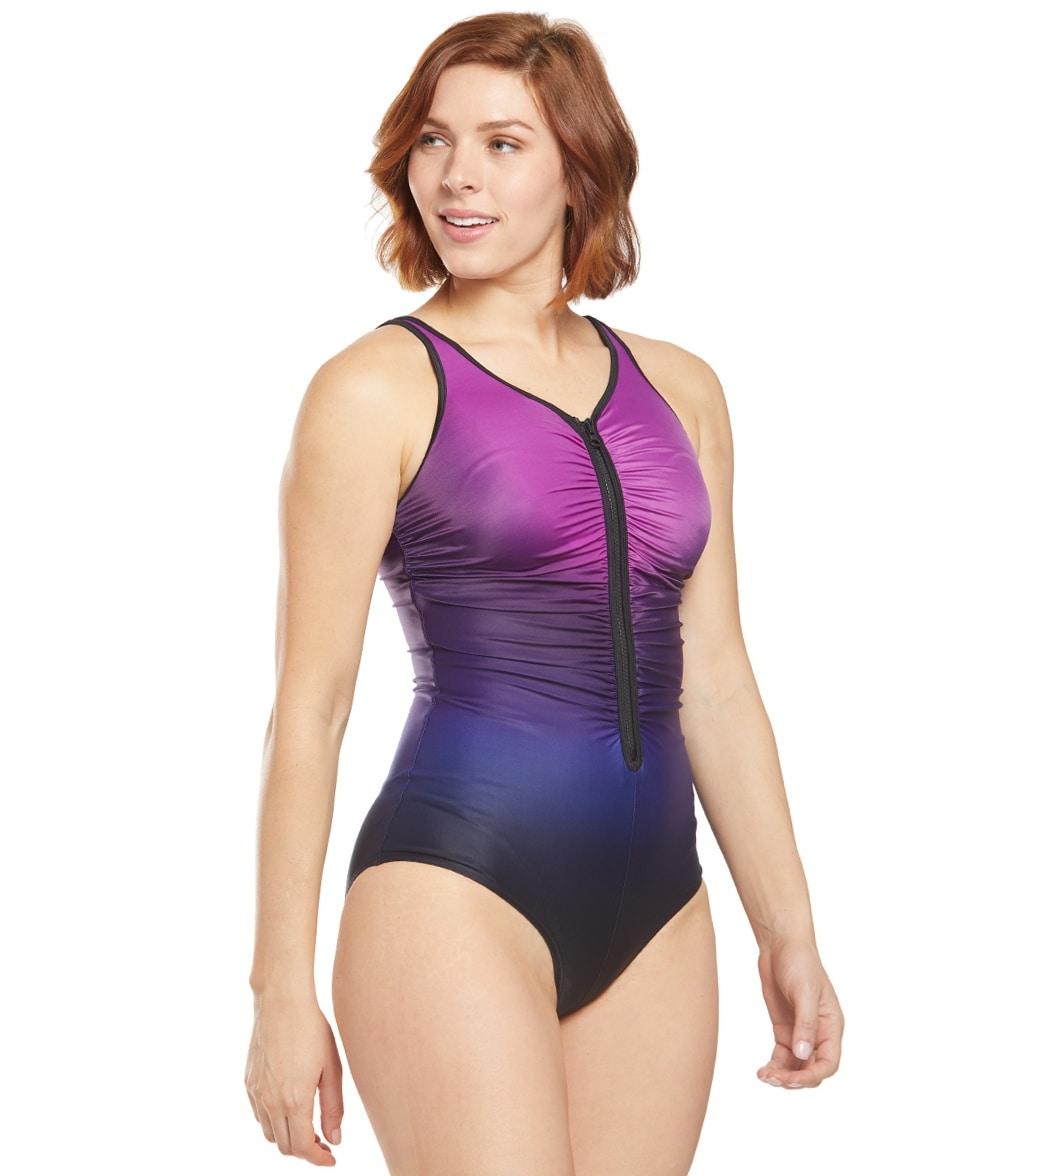 8e3d784d2f17a Speedo Women's Plunge Zip Ombre One Piece Swimsuit at SwimOutlet.com ...